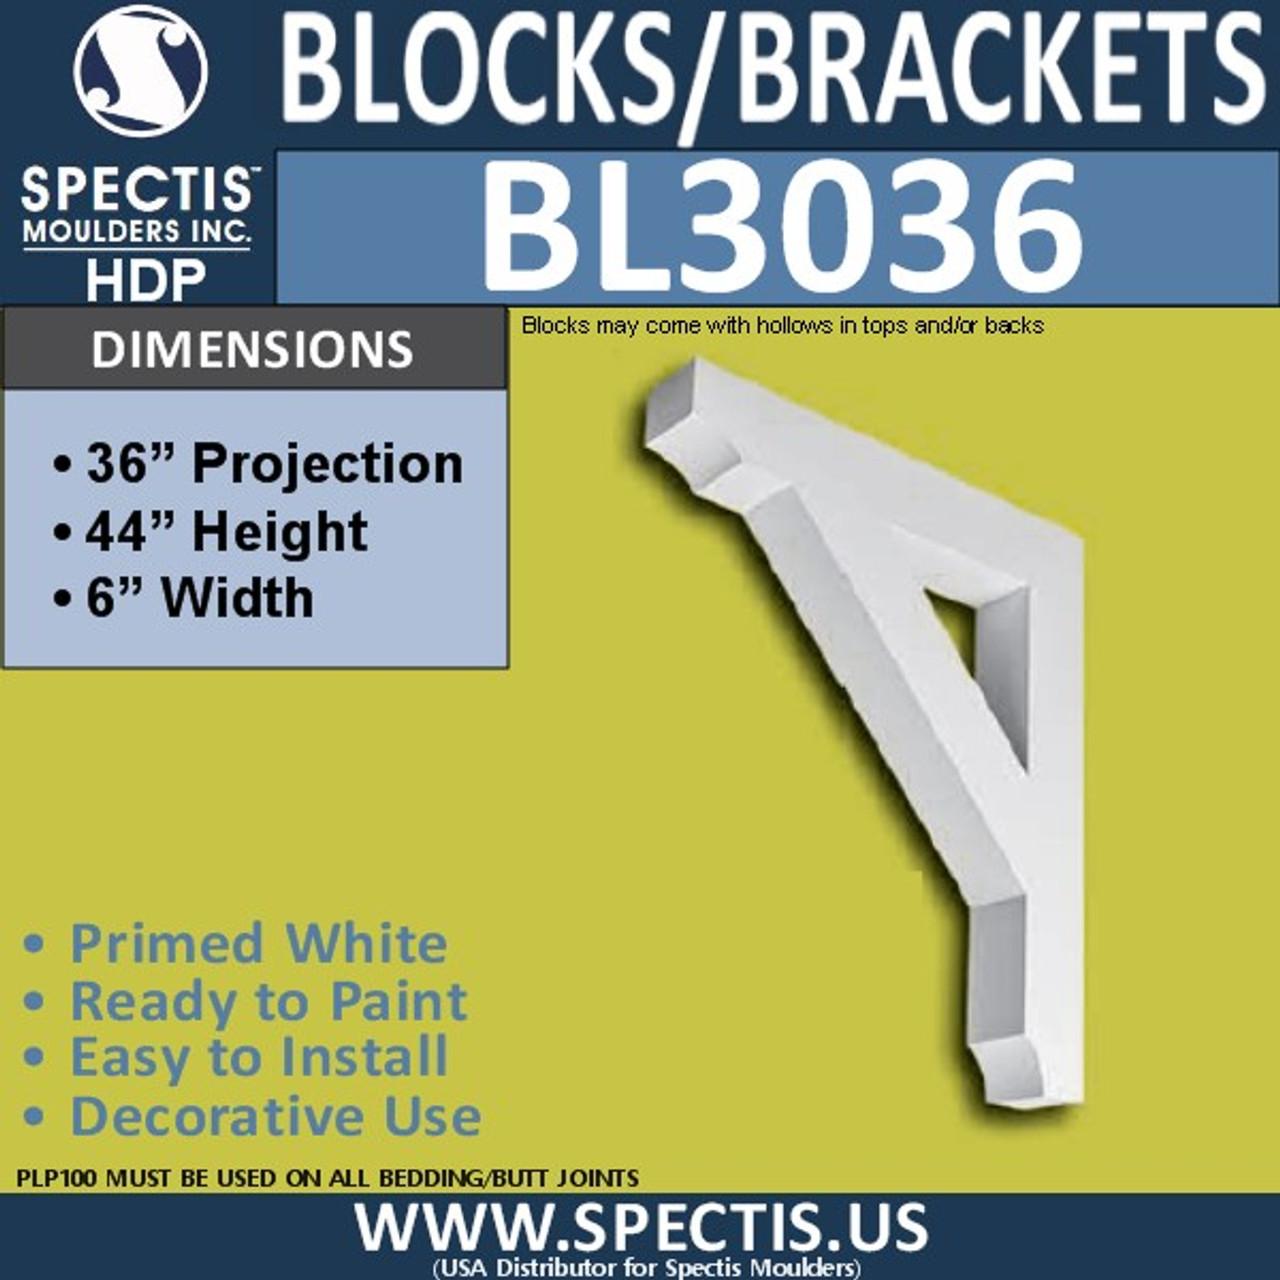 "BL3036 Eave Block or Bracket 6""W x 42""H x 36"" P"